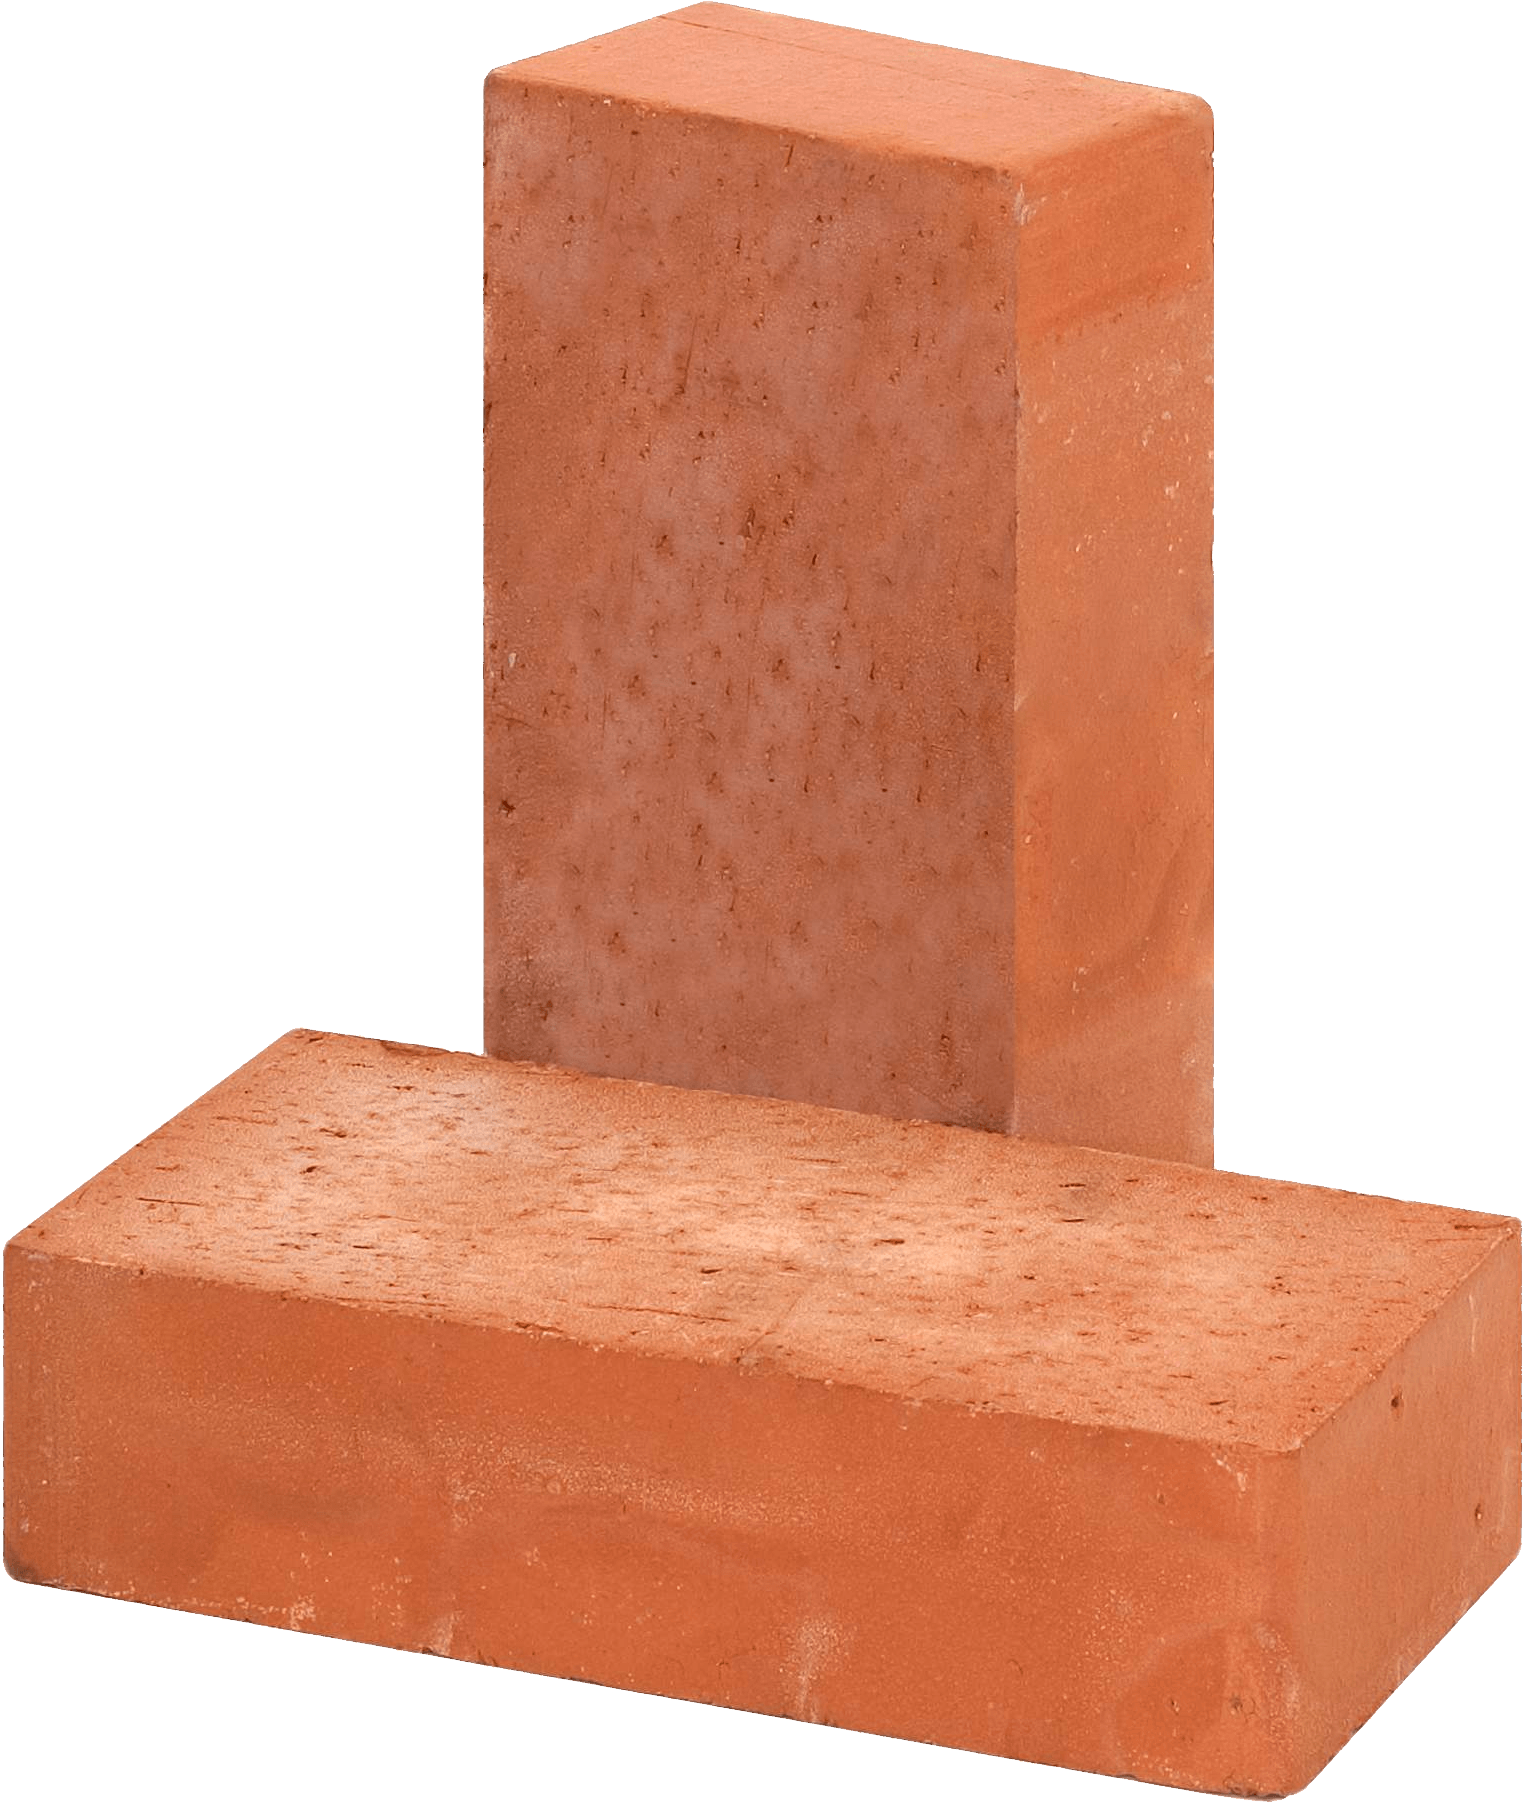 Brick PNG - 2418